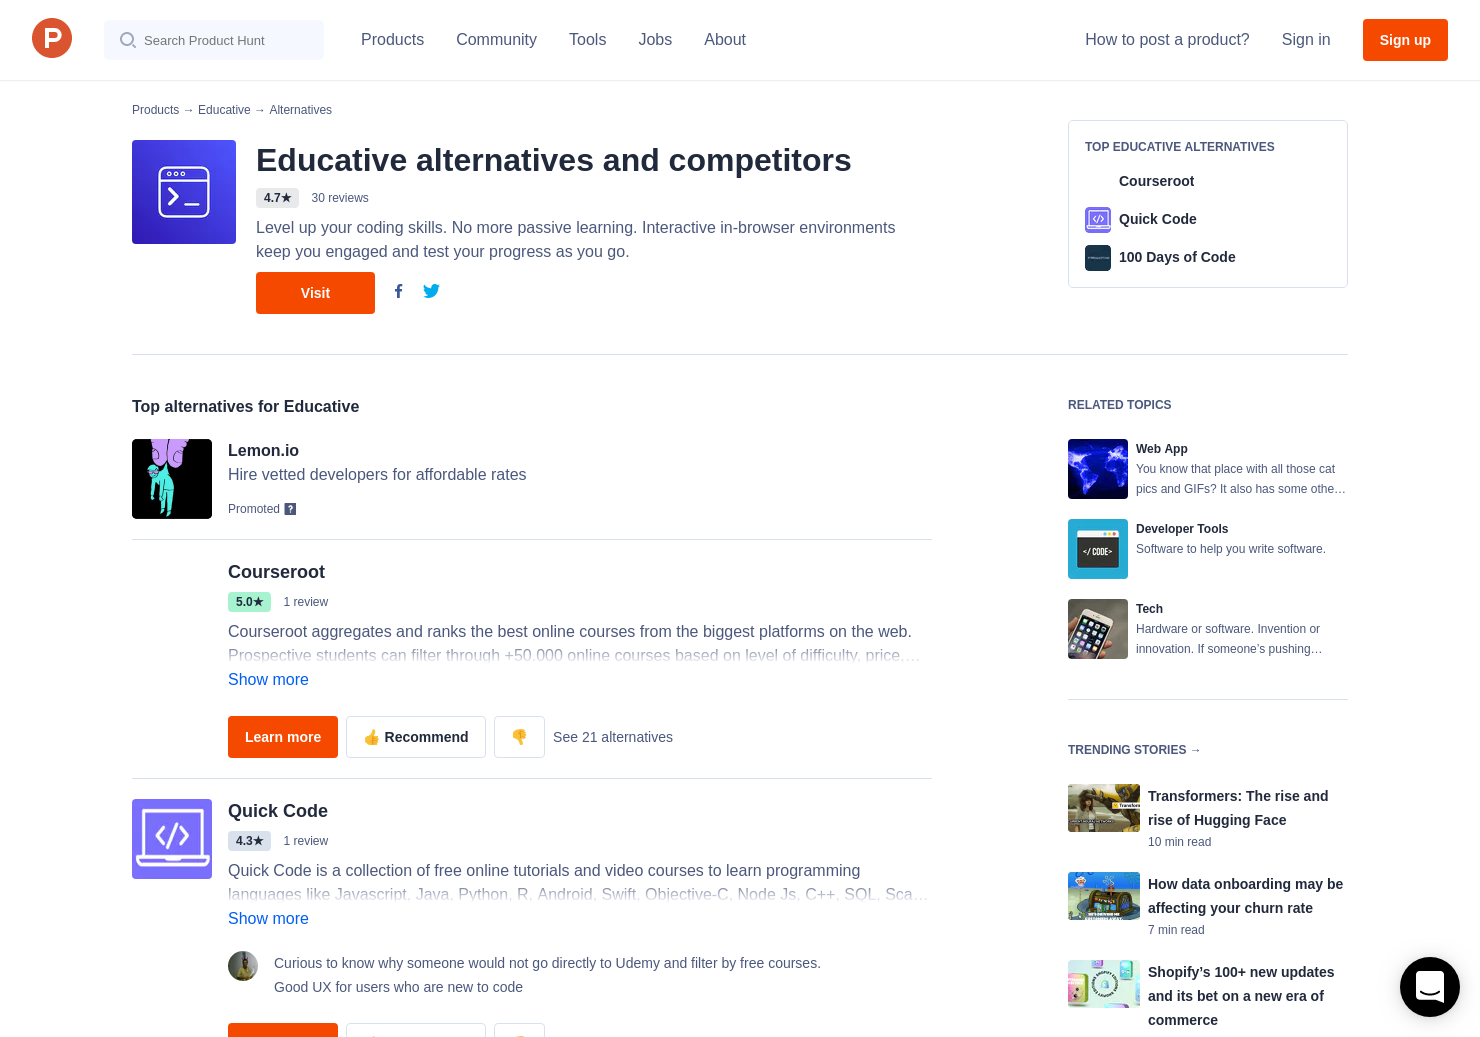 10 Alternatives to Educative | Product Hunt